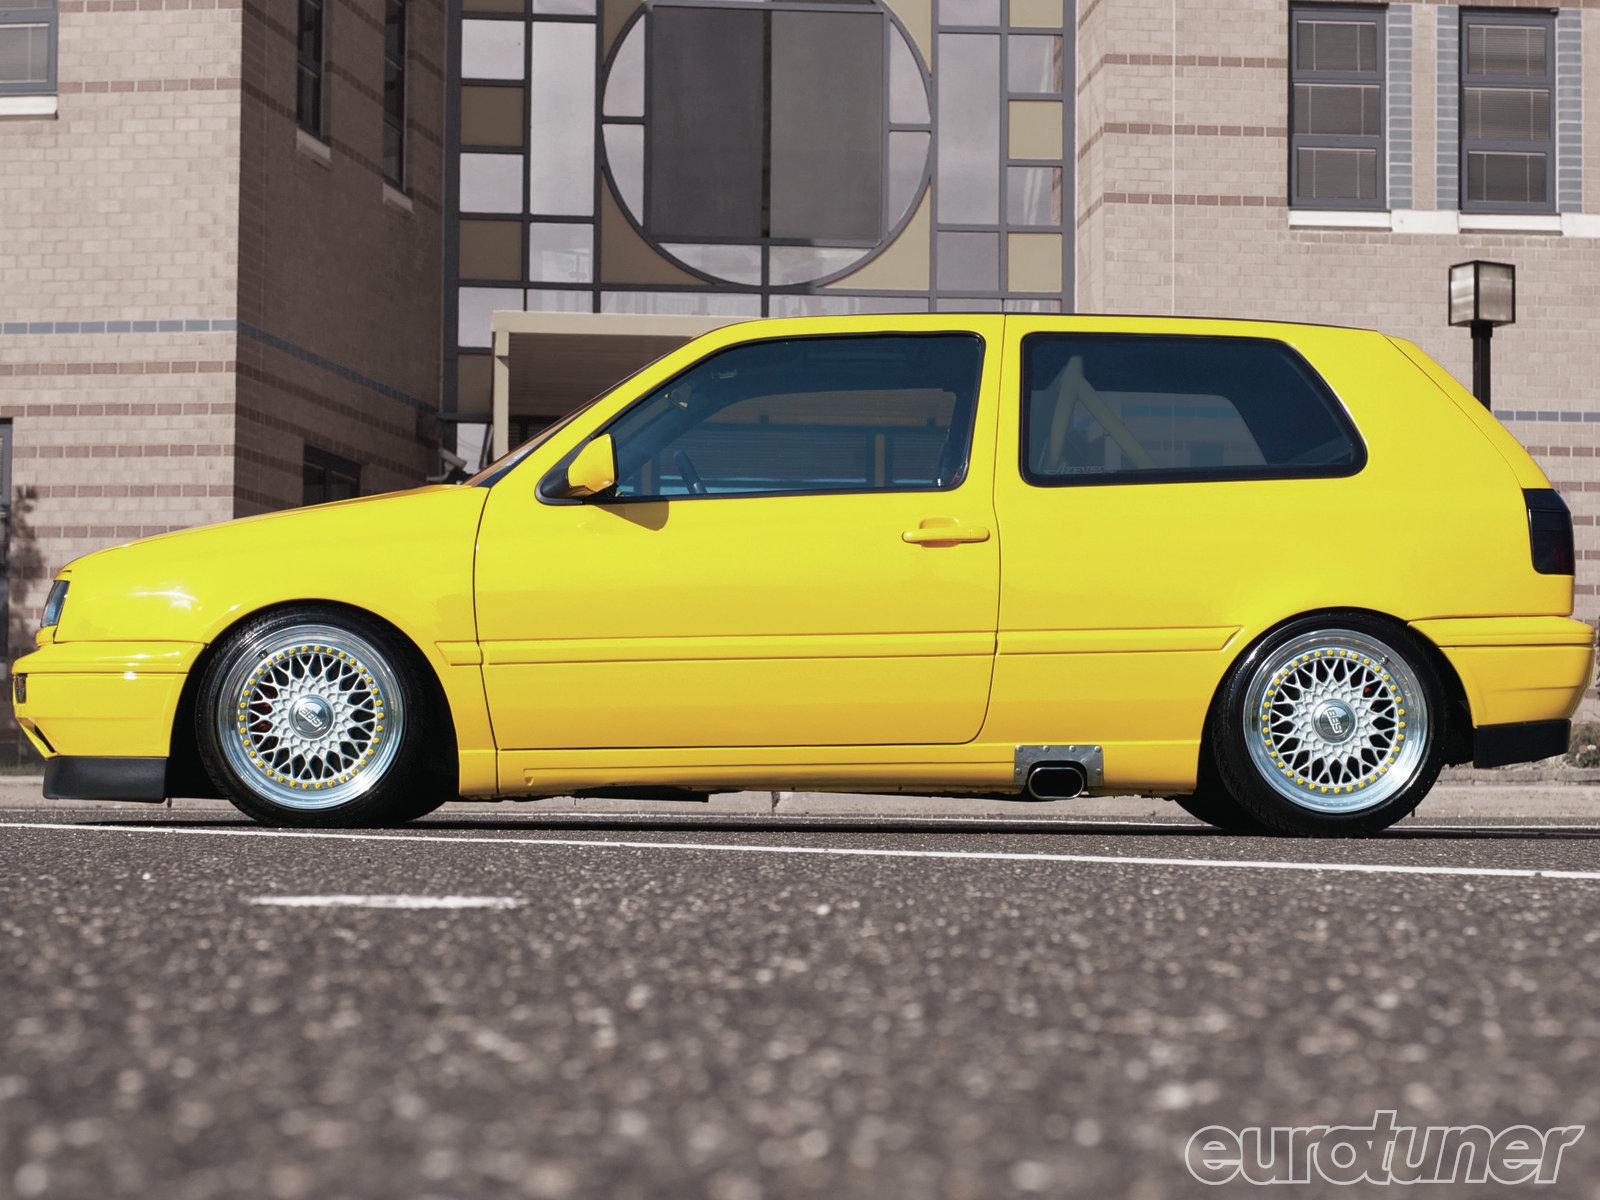 1998 VW GTI VR6 - Hooptie - Eurotuner Magazine